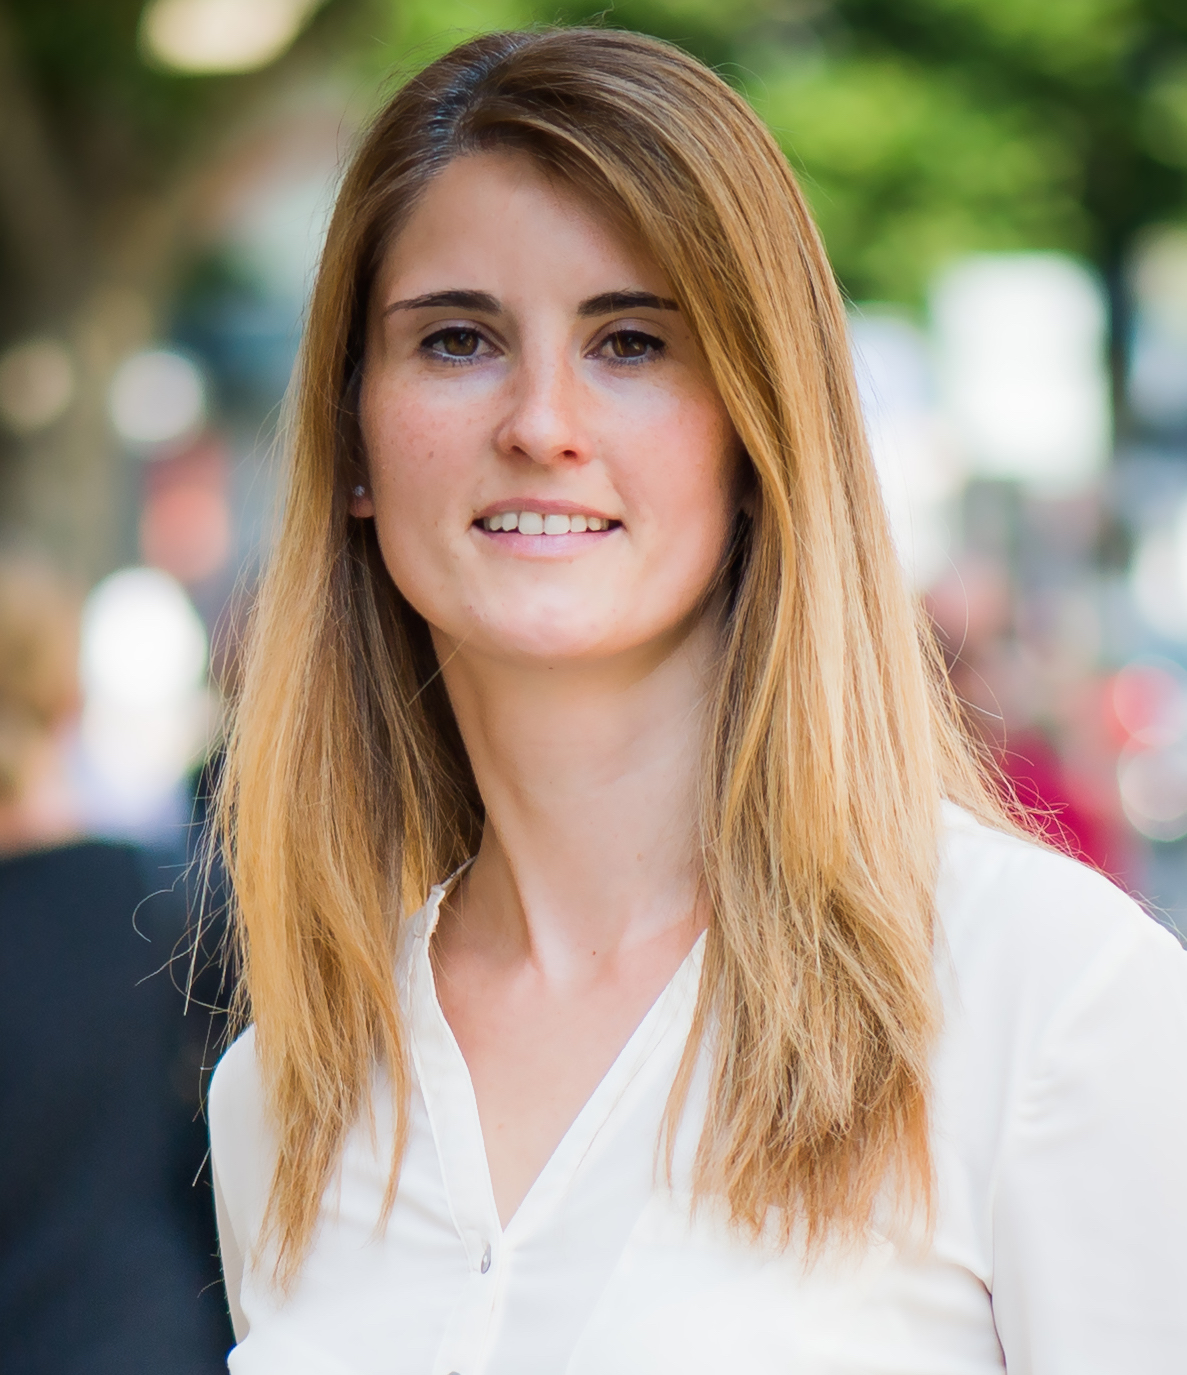 Anemarija Soldo, Organisationswartin orgawart@tc-moensheim.de